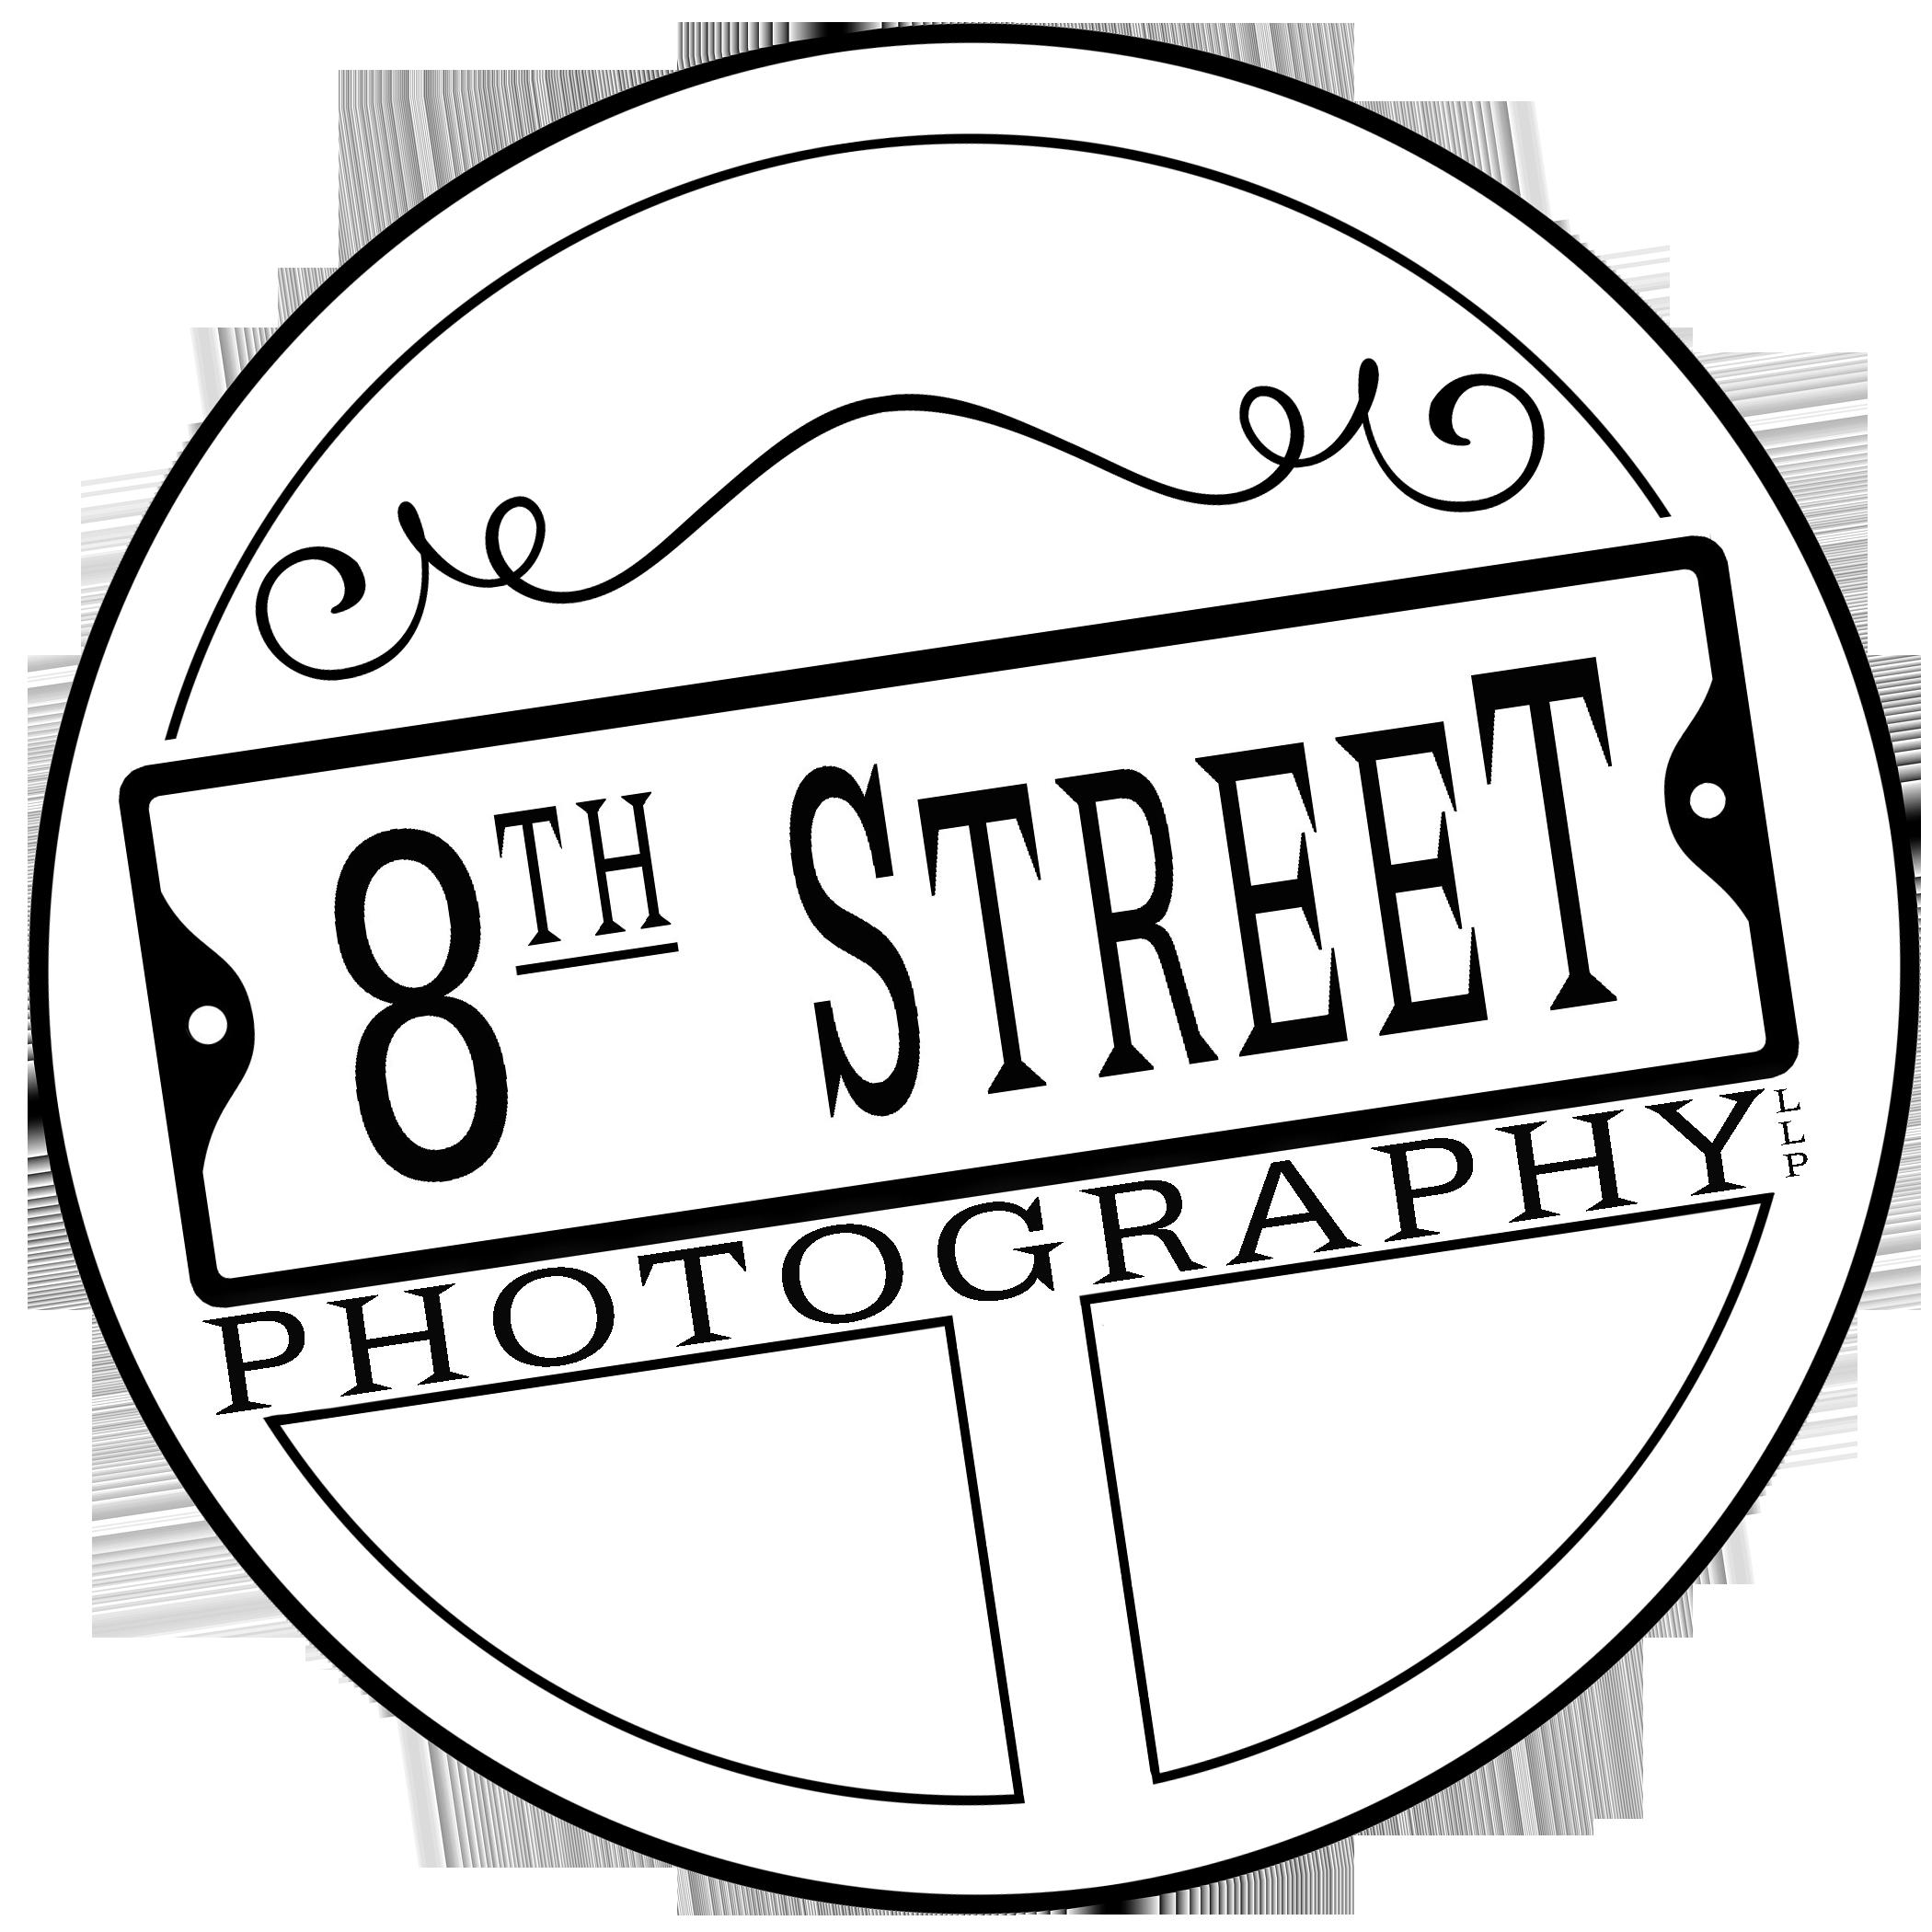 8th Street Photography L.L.P.